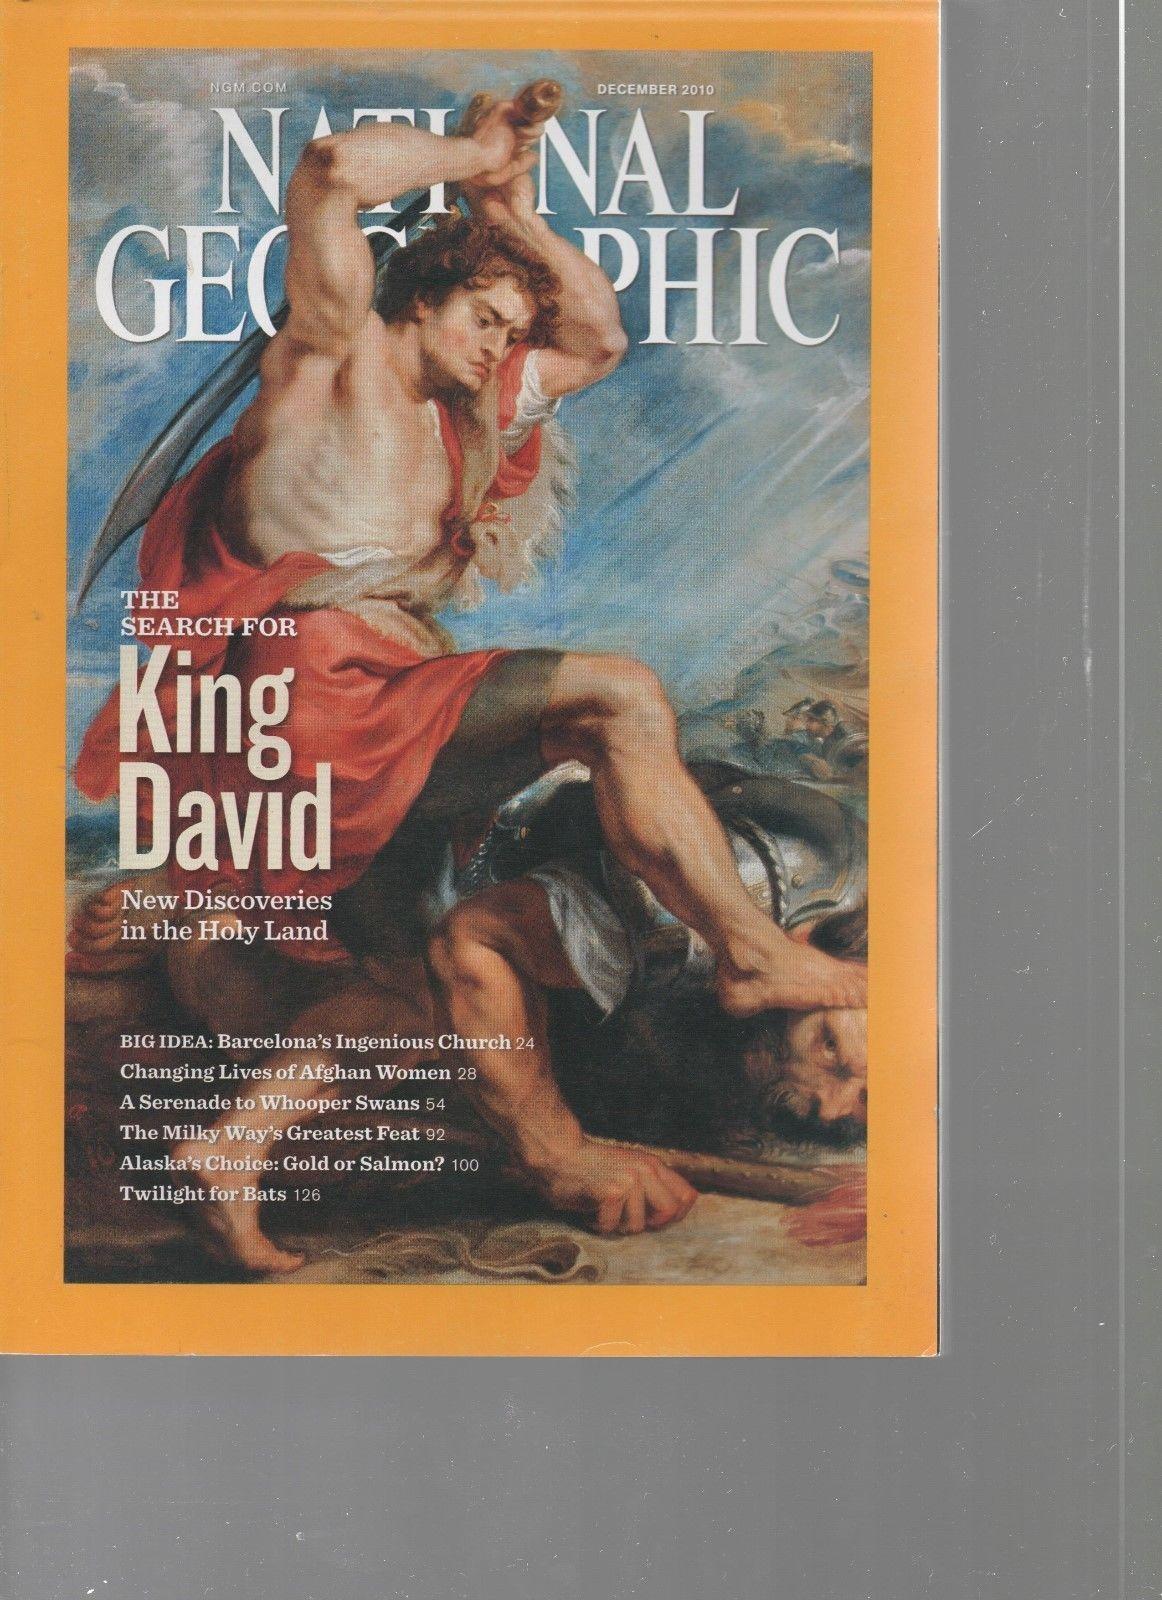 National Geographic - December 2010   King David, Barcelona, Afghan Women, Swans